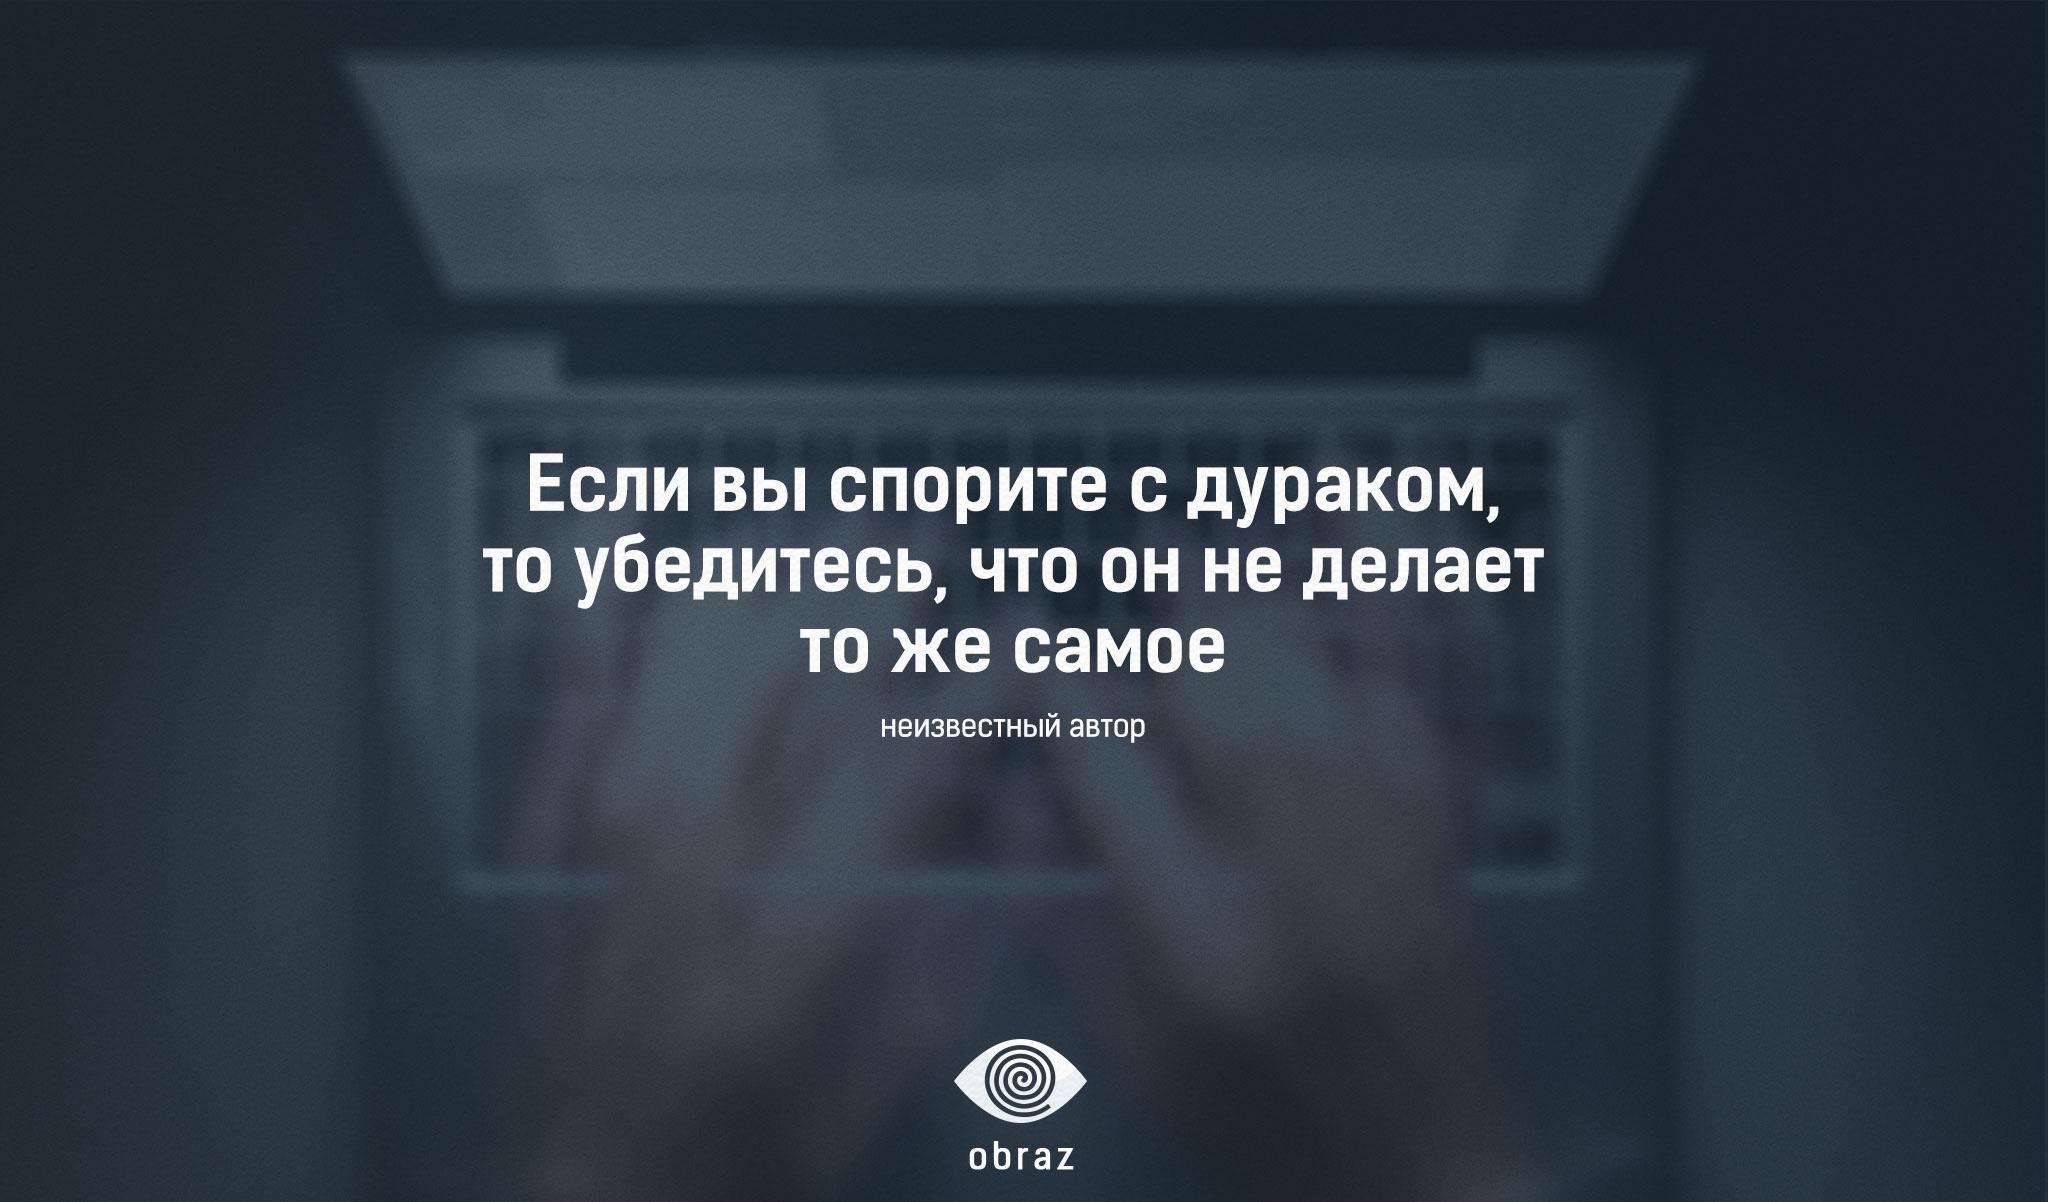 Email:learningkurakov@gmail com3292 1009p6x.vsmiqc9pb9